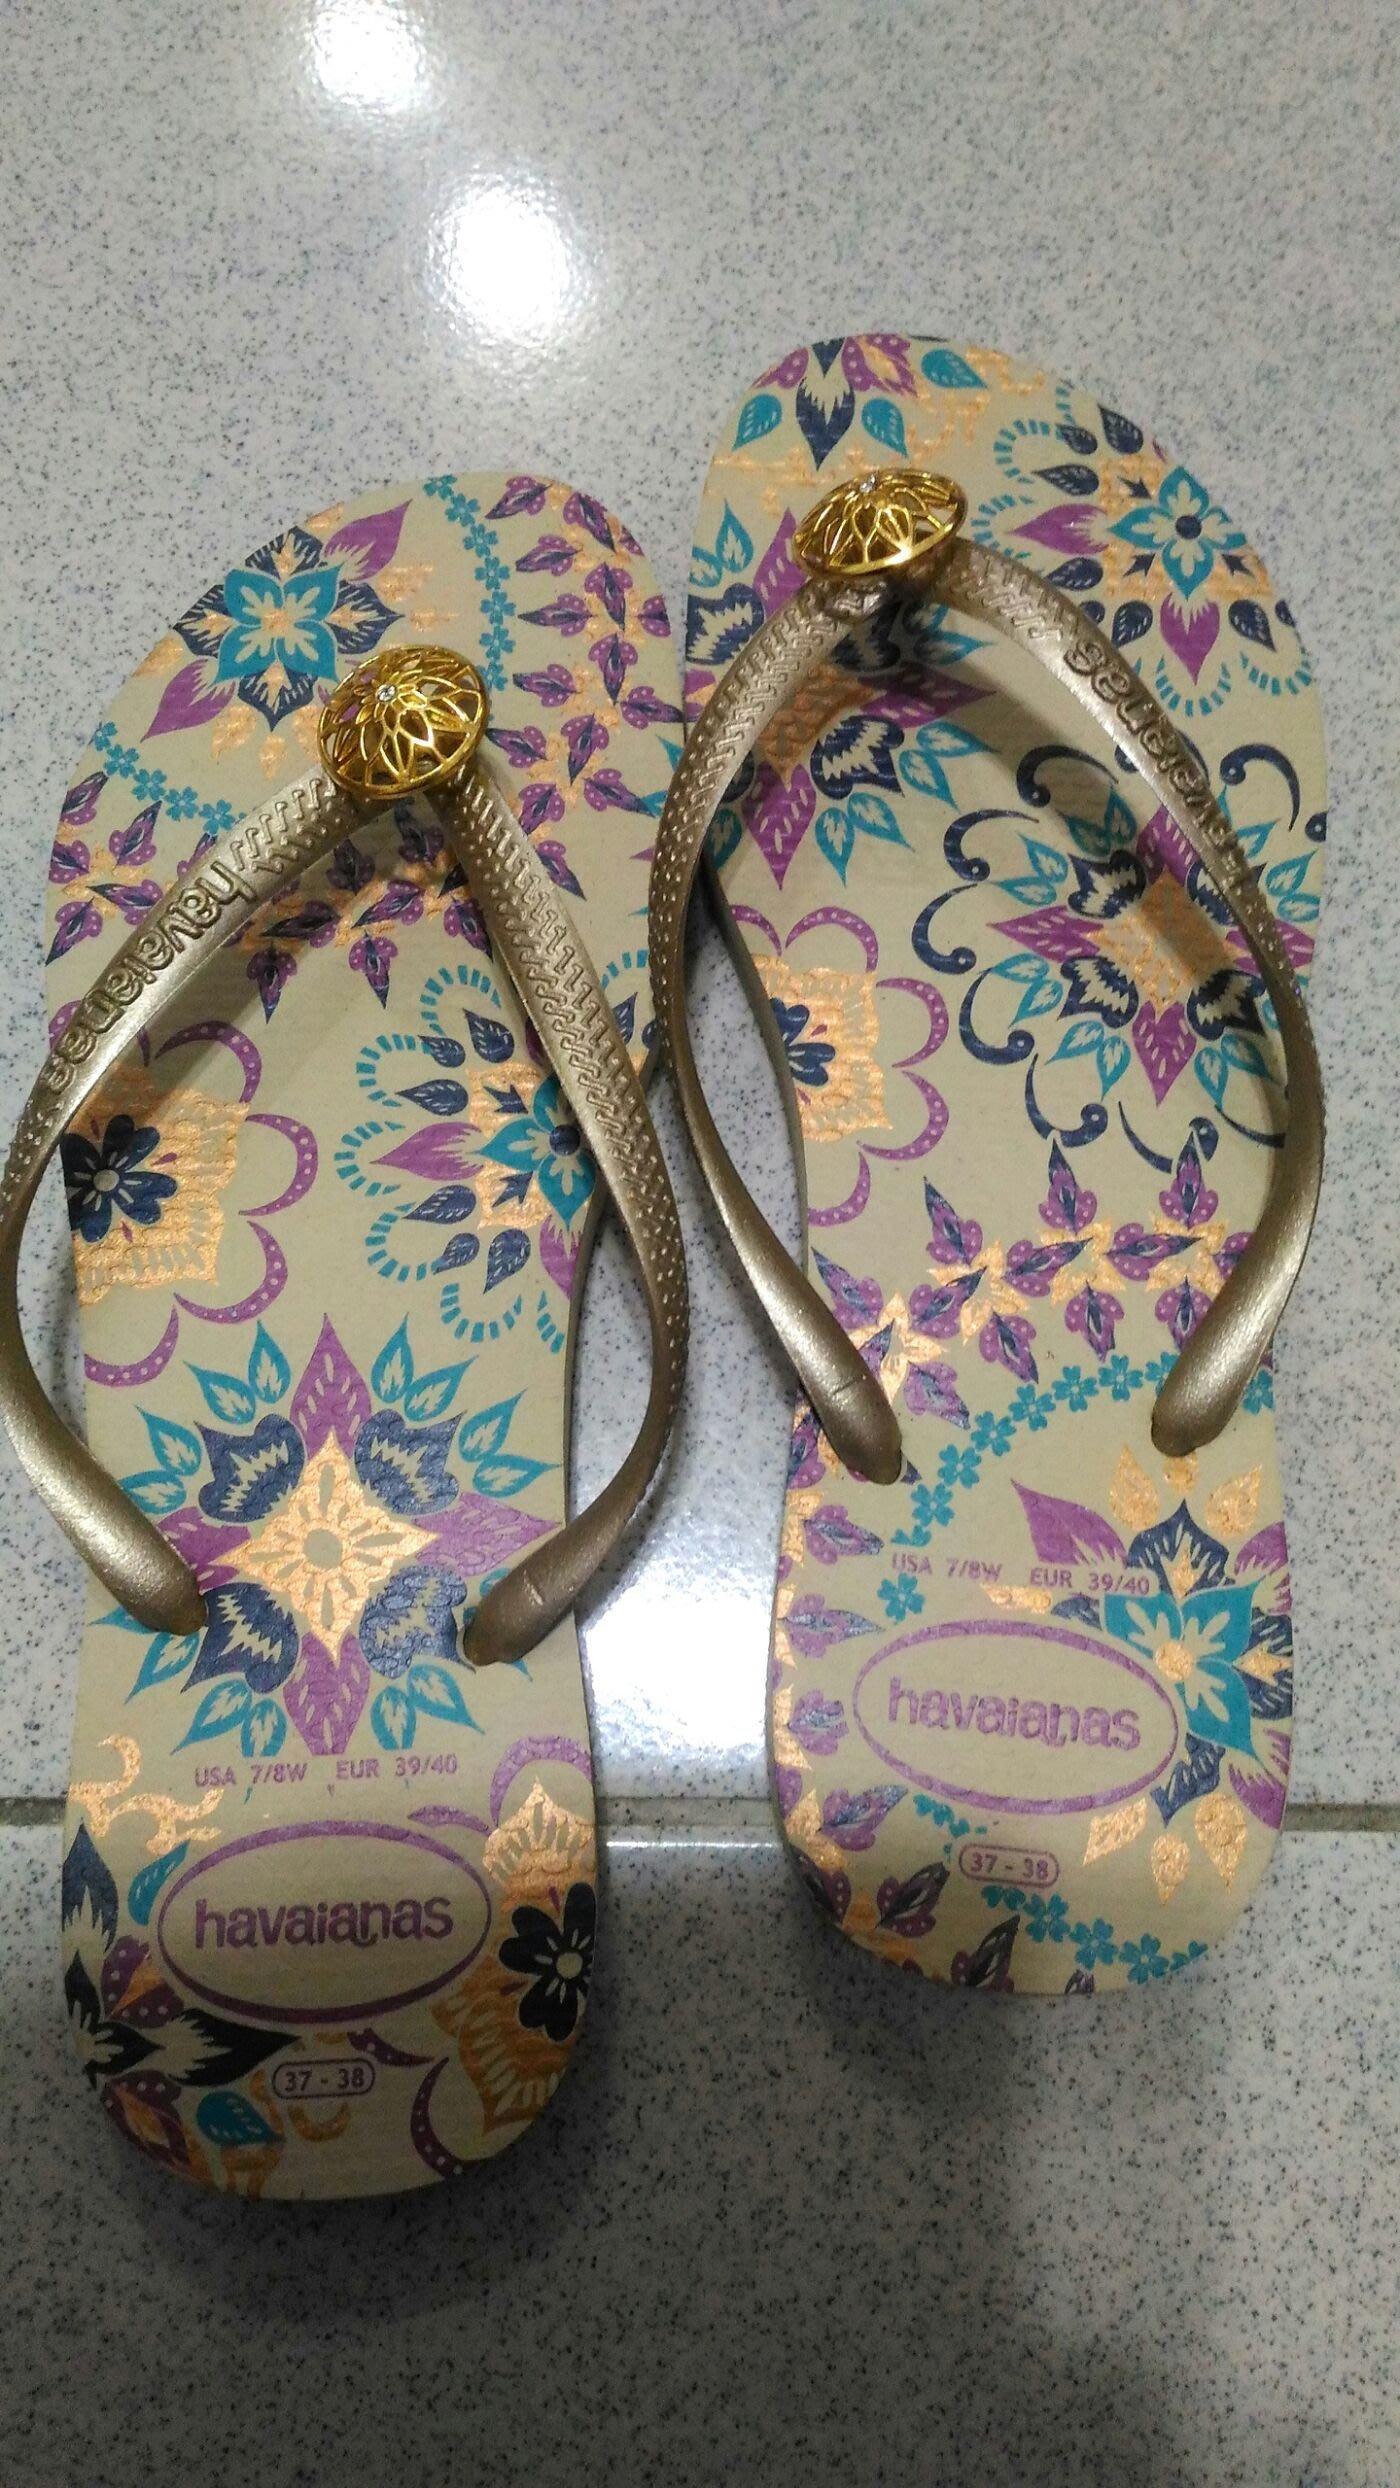 havaianas 夾腳拖 拖鞋 巴西代購 美國 海灘鞋 夏天 海邊 必備